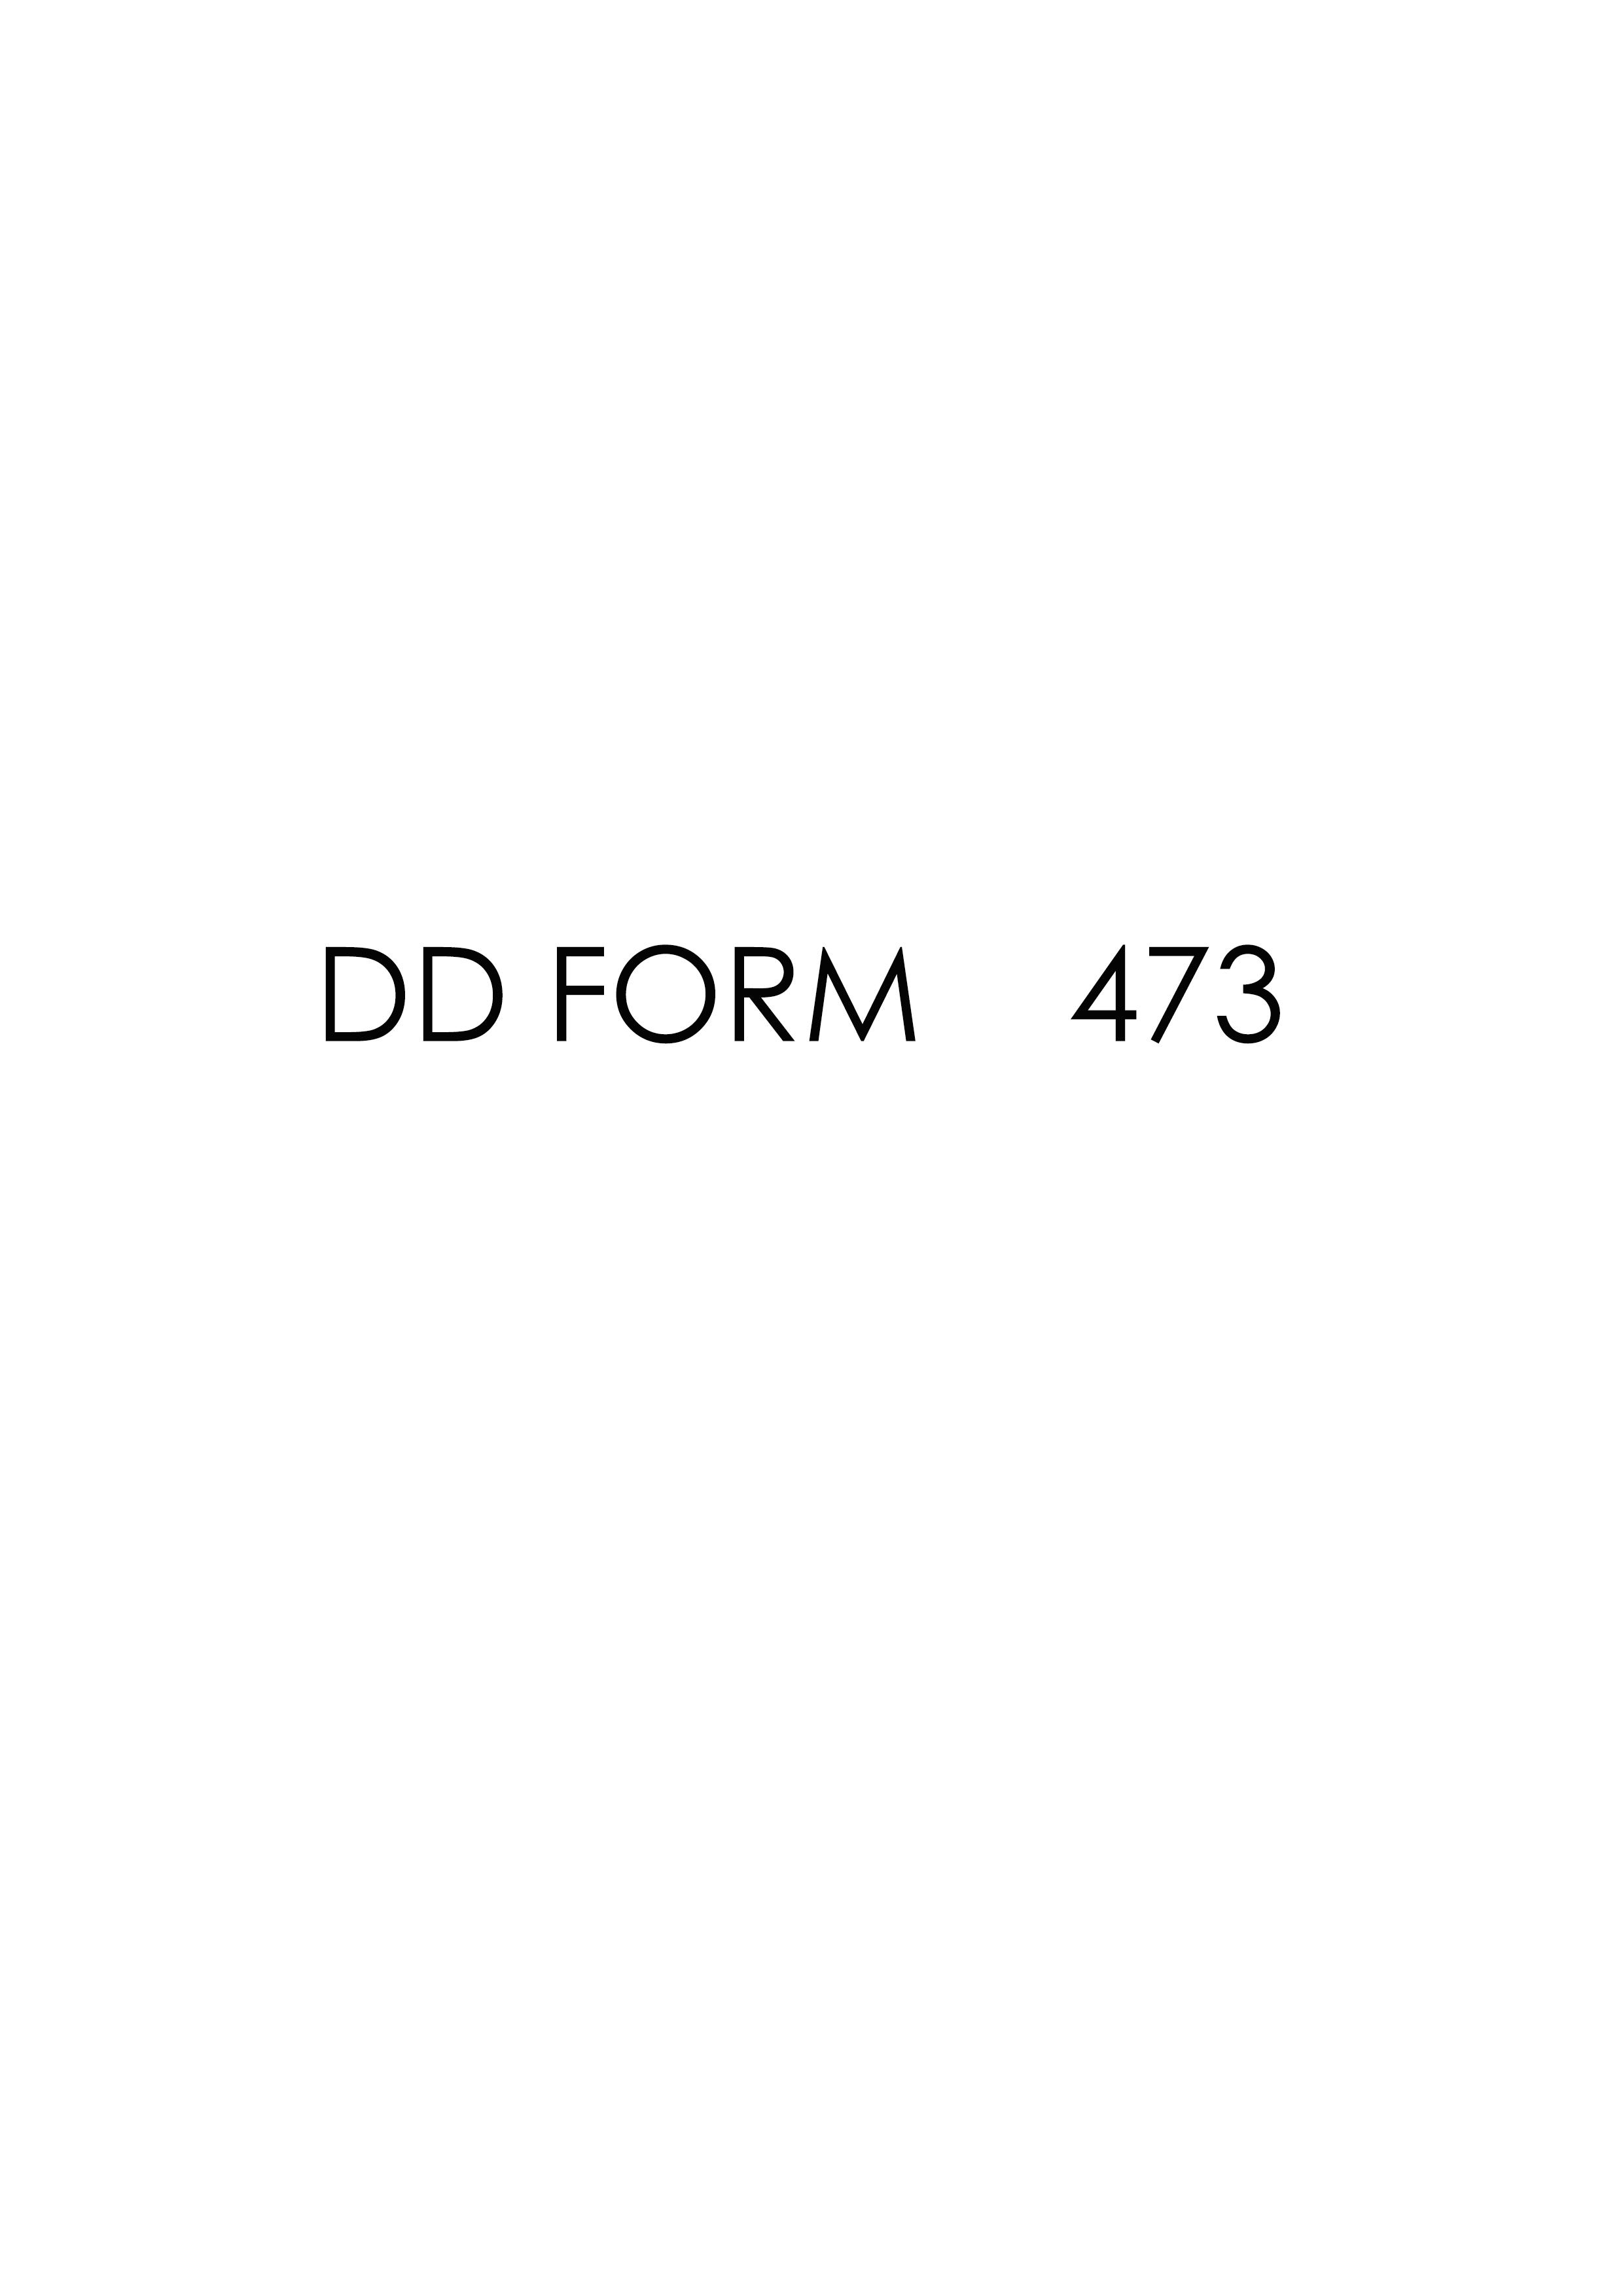 Download dd Form 473 Free